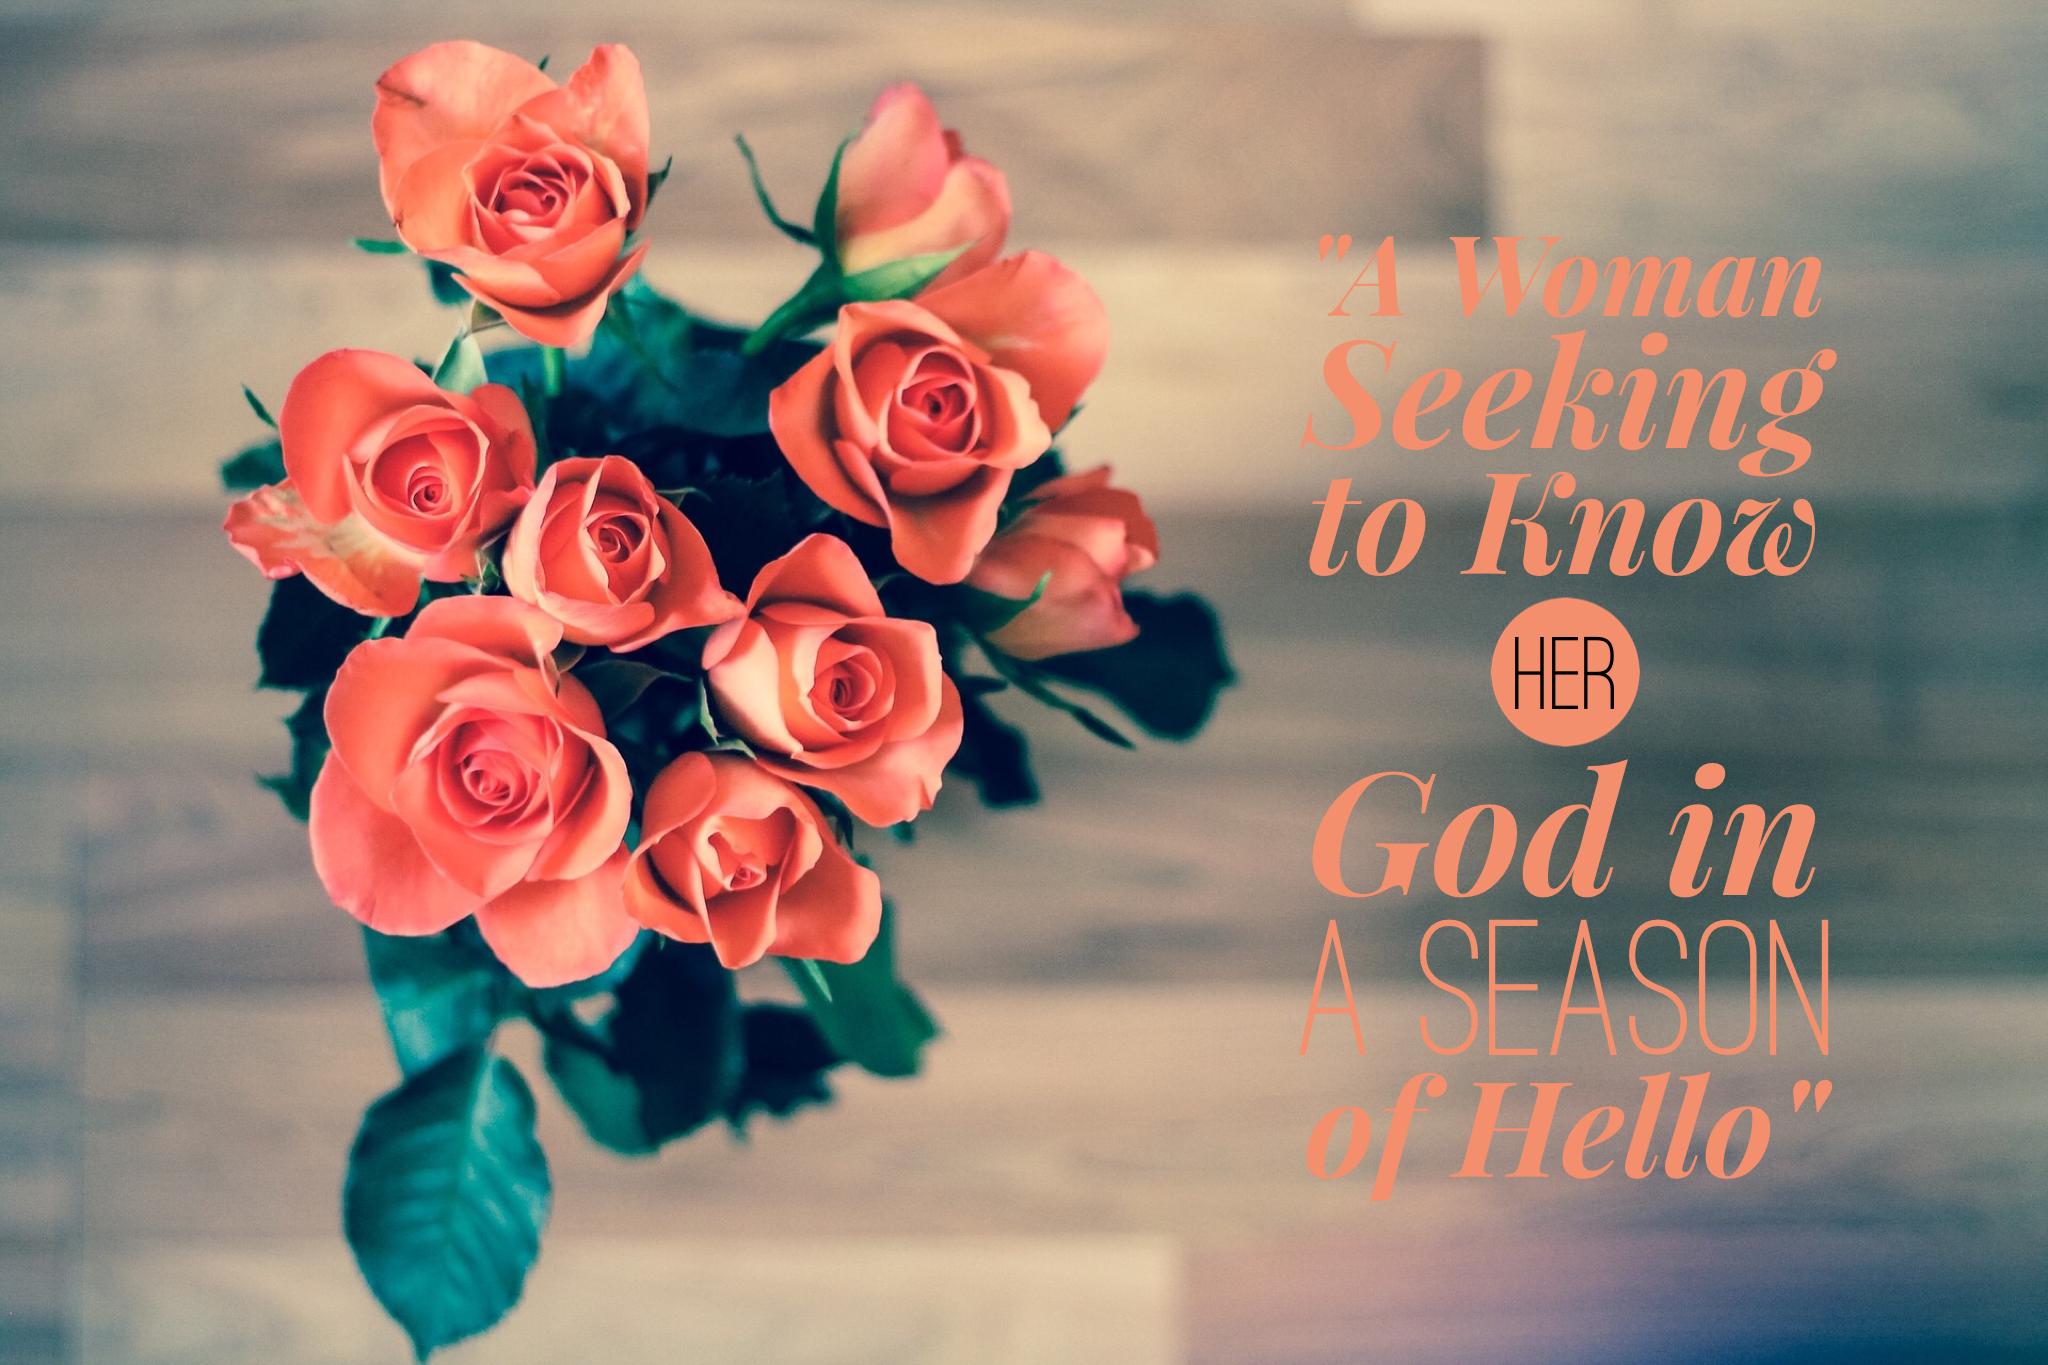 A Woman Seeking to Know Her God in a Season of Hello | www.codyandras.com/2017/8/26/a-woman-seeking-to-know-her-god-in-a-season-of-hello